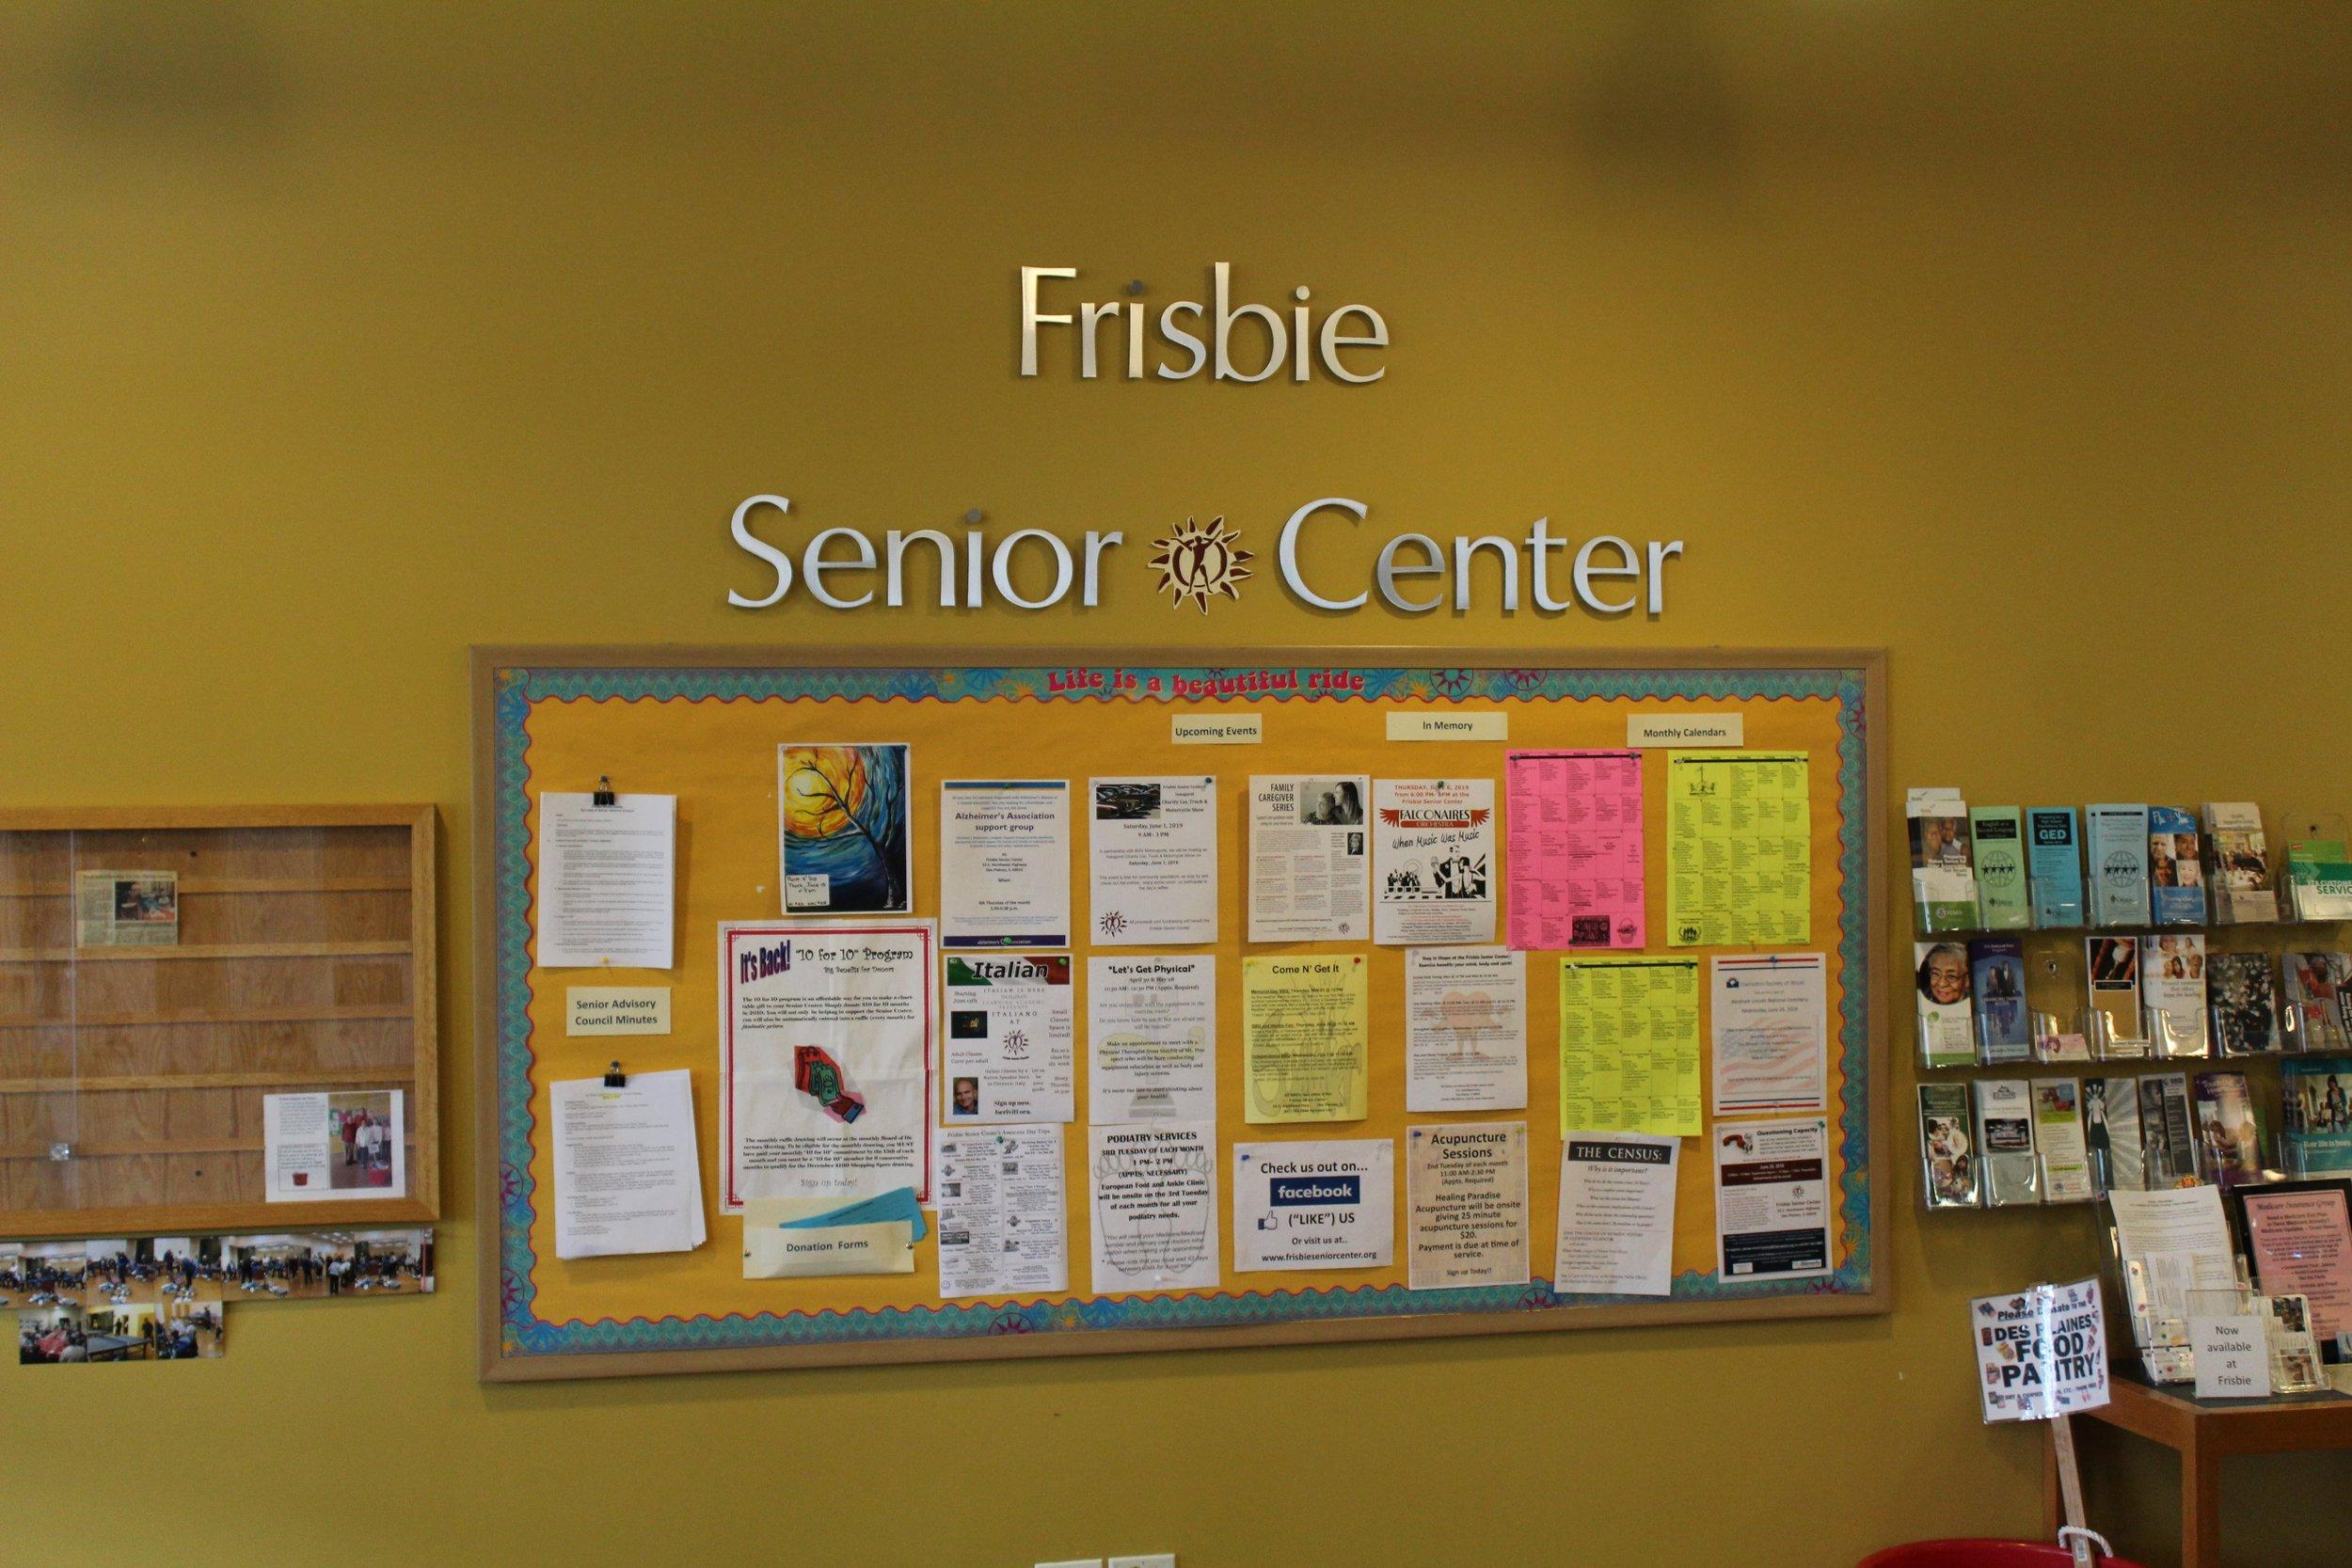 Rizzo-Young-Marketing-LLC-Frisbie-Senior-Center-Foyer.JPG